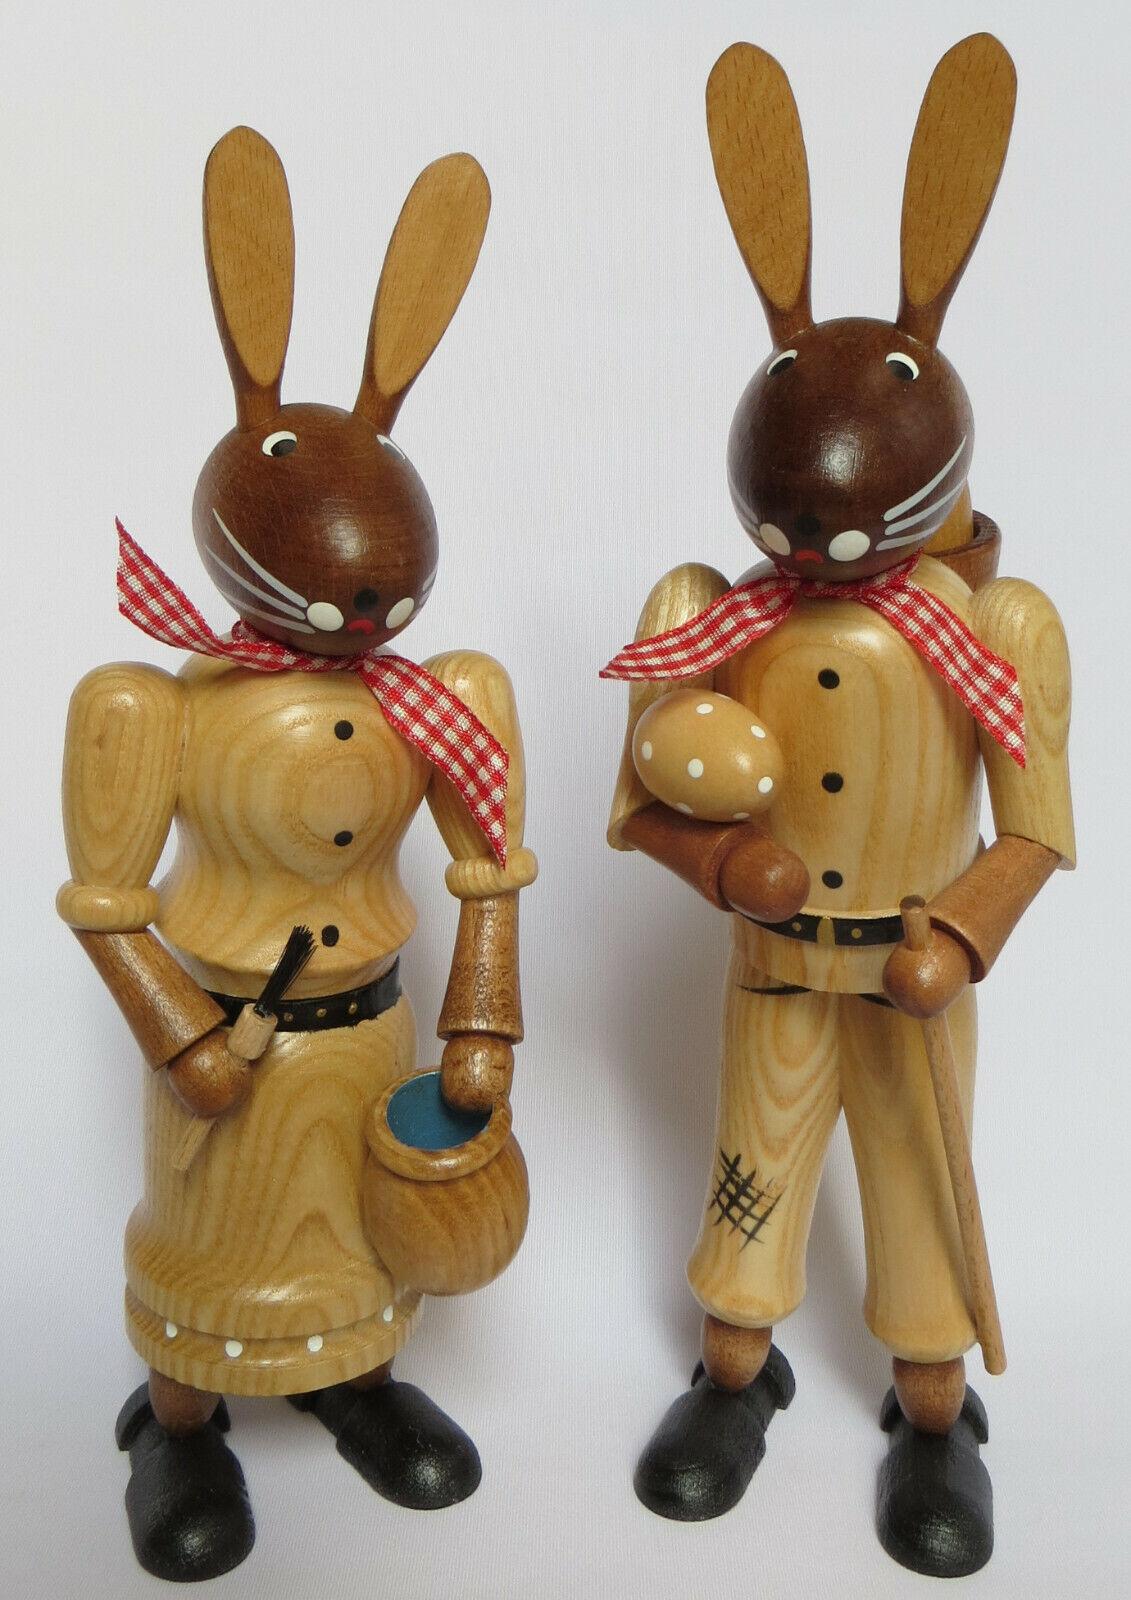 Osterhasenpaar 23cm groß natur-Holz Erzgebirge Handarbeit Hasen-Paar Osterhasen